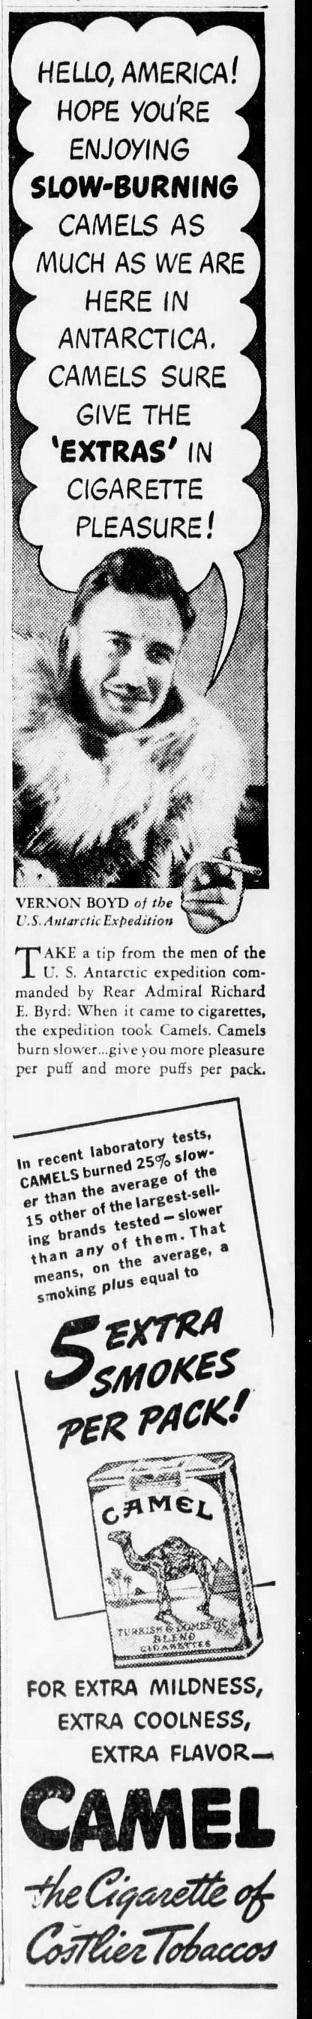 The_Brooklyn_Daily_Eagle_Mon__Feb_19__1940_.jpg